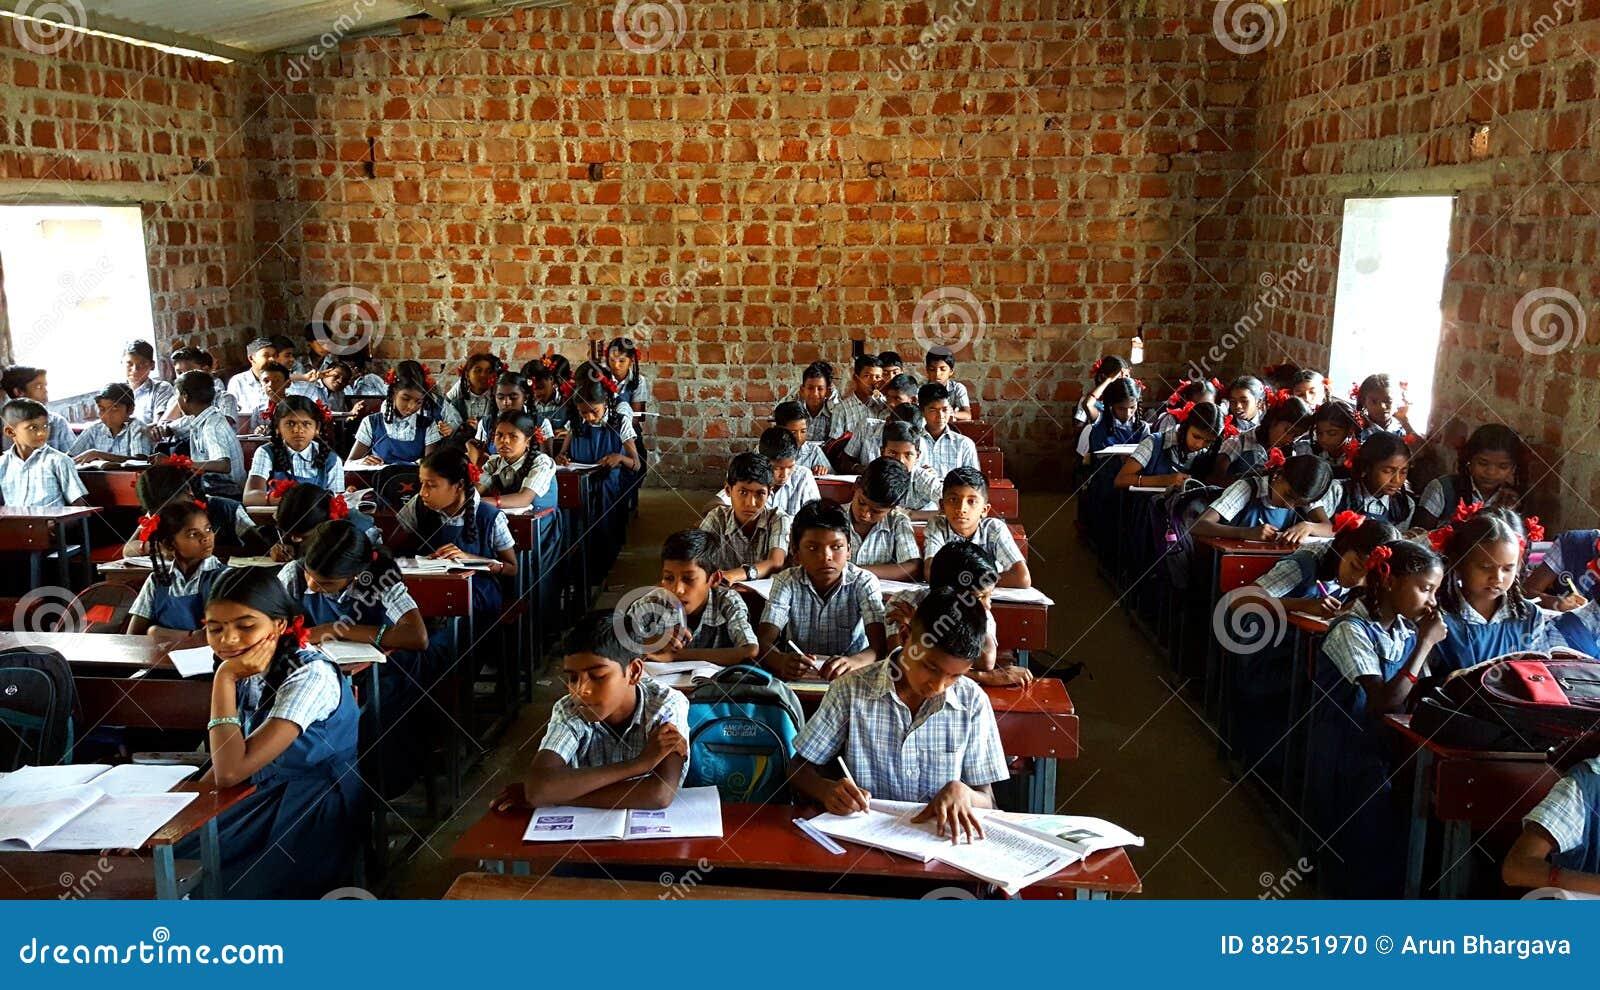 Scuola tribale in India